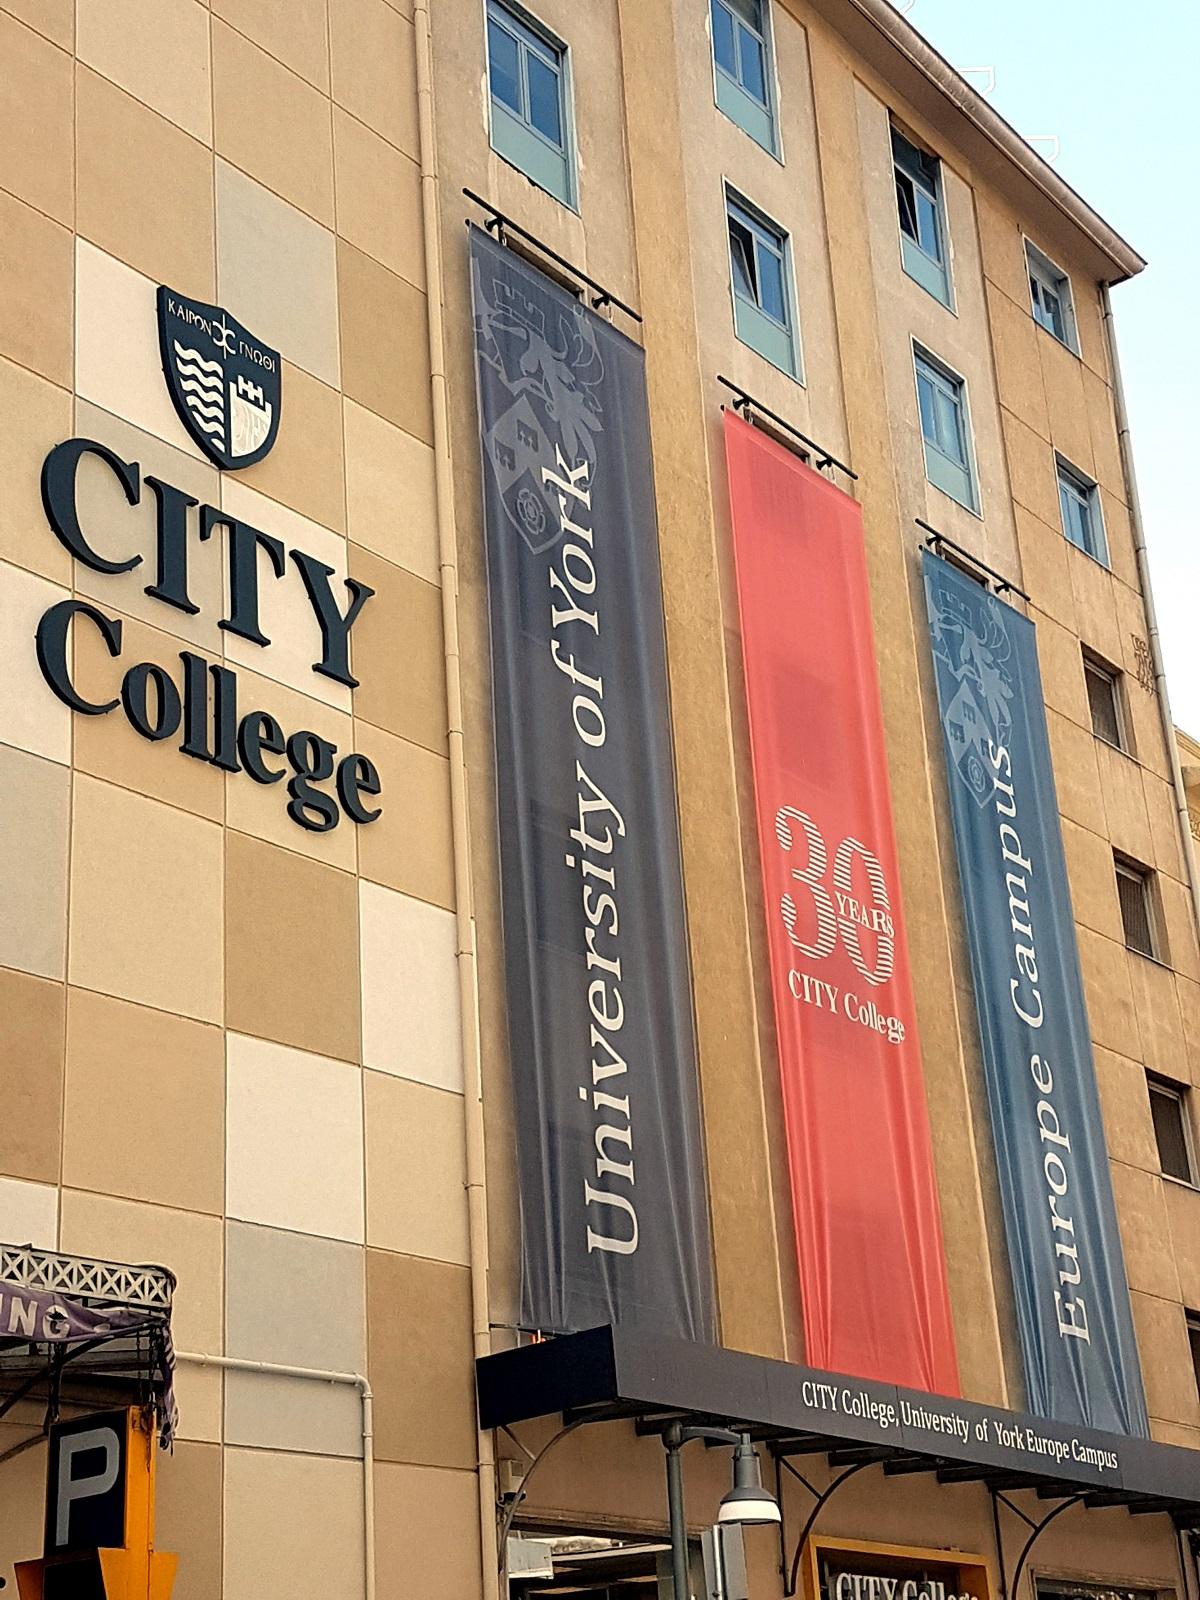 CITY College: Μεταπτυχιακές σπουδές υψηλής εξειδίκευσης στο Ευρωπαϊκό Campus του Πανεπιστημίου του York στη Θεσσαλονίκη